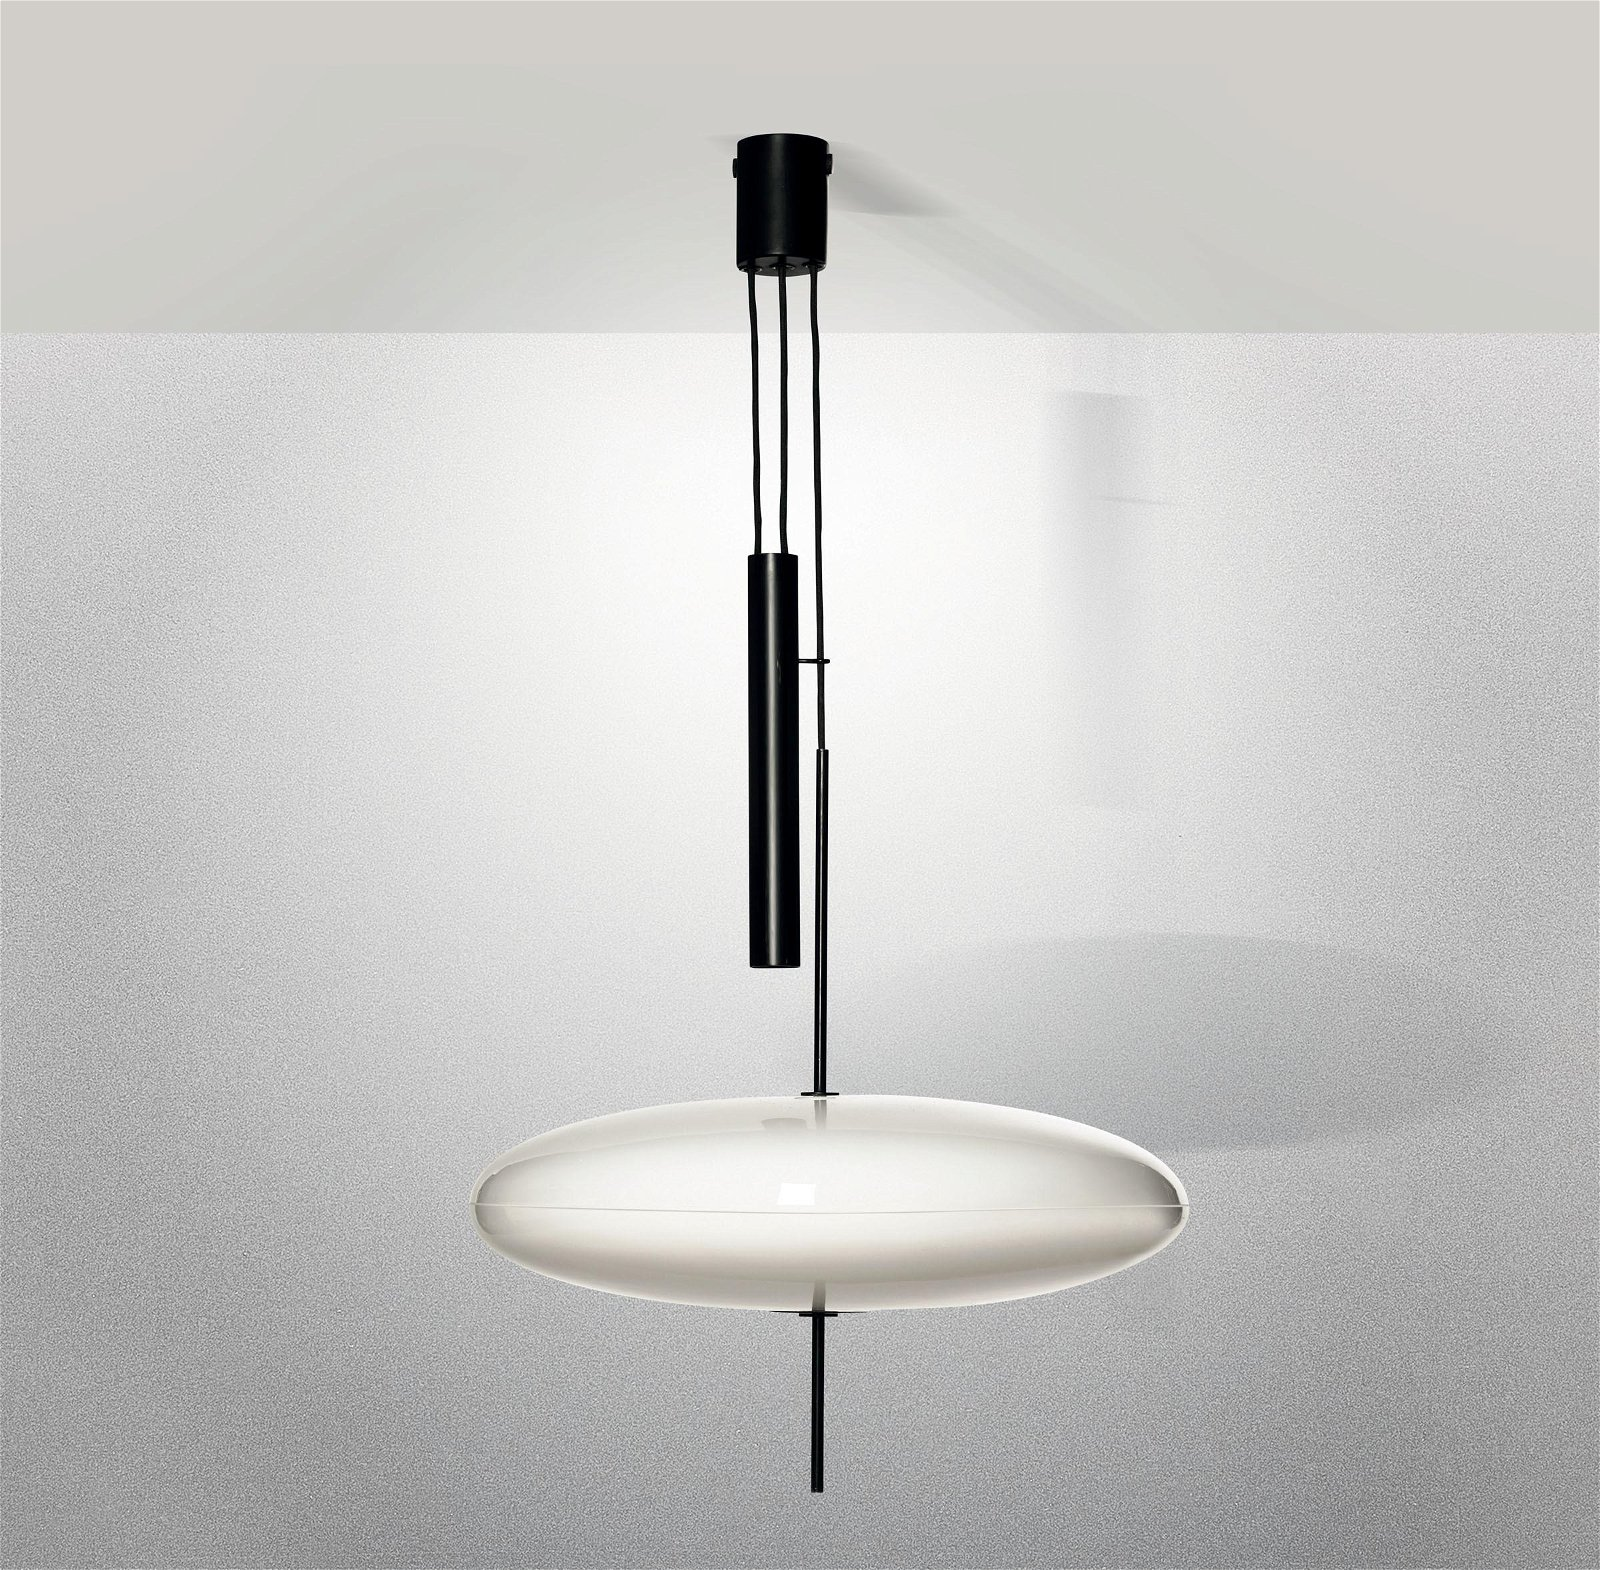 G. Sarfatti, mod. 2065 GF lamp, Italy, 1958